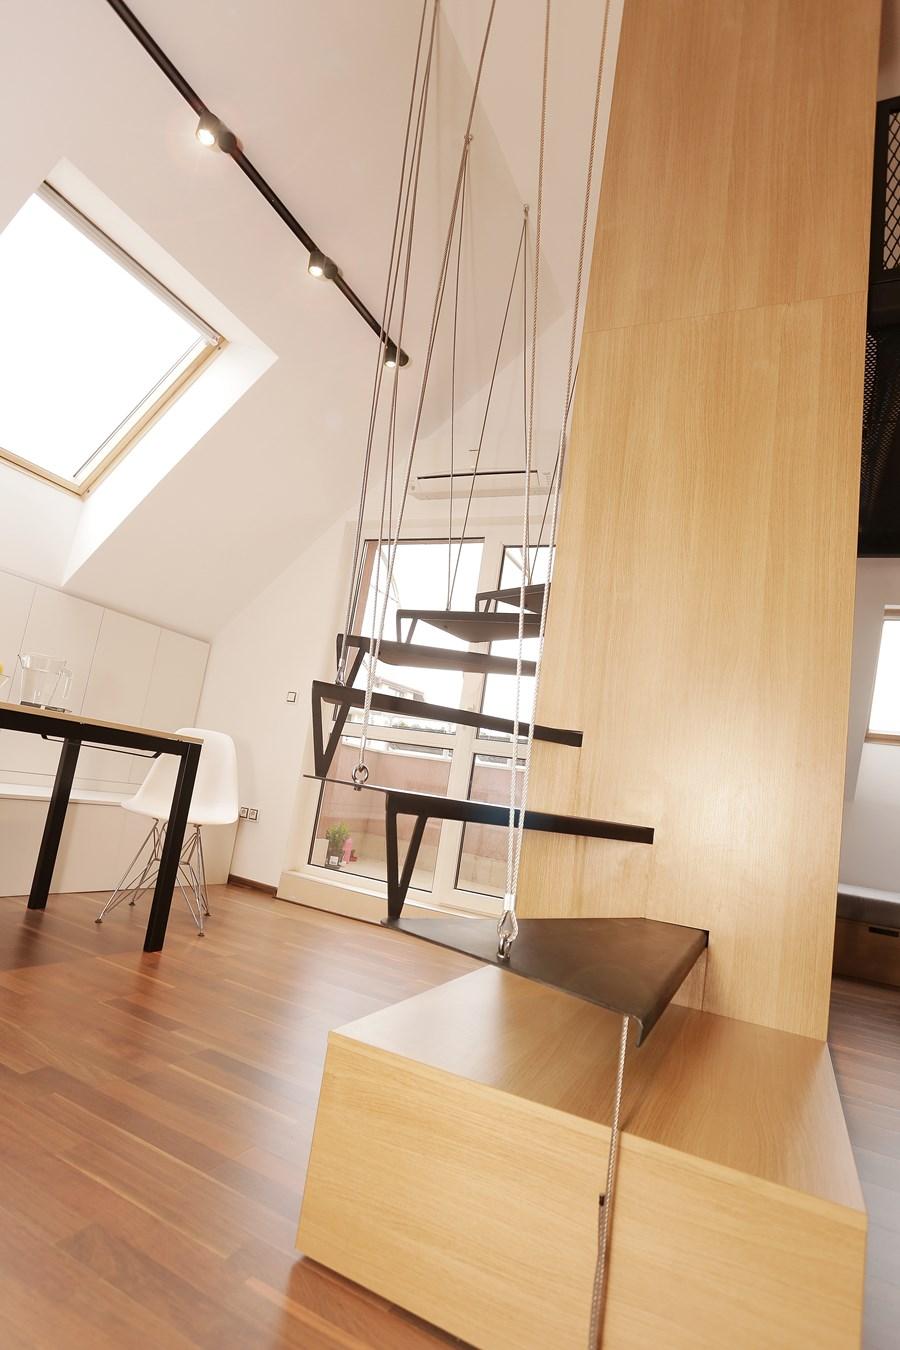 Small apartment by Edo Design Studio 15